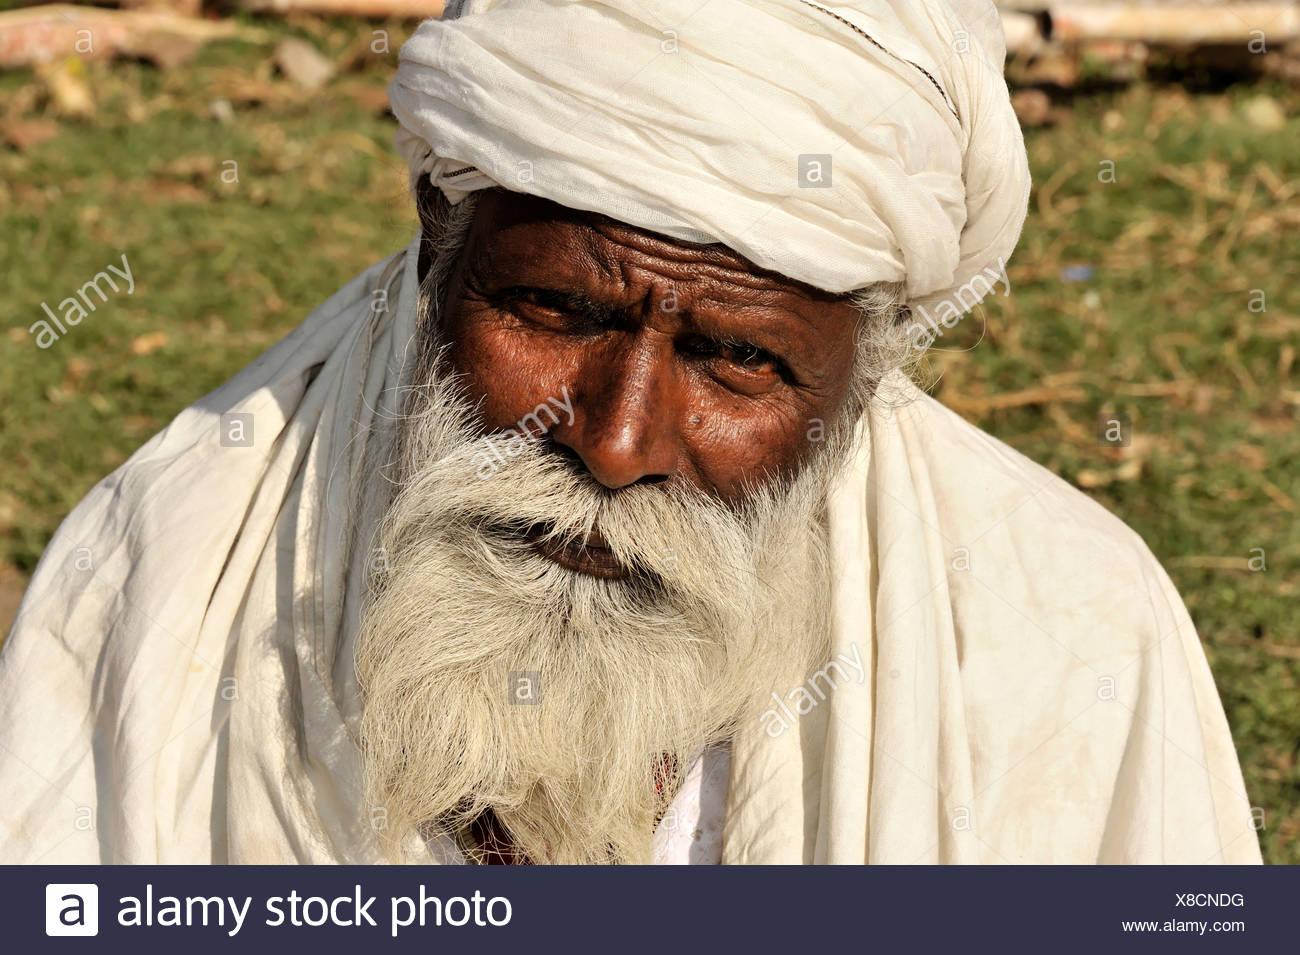 Old Nepali man, thoughtful, observant, portrait, Kathmandu, Kathmandu Valley, Nepal, Asia - Stock Image